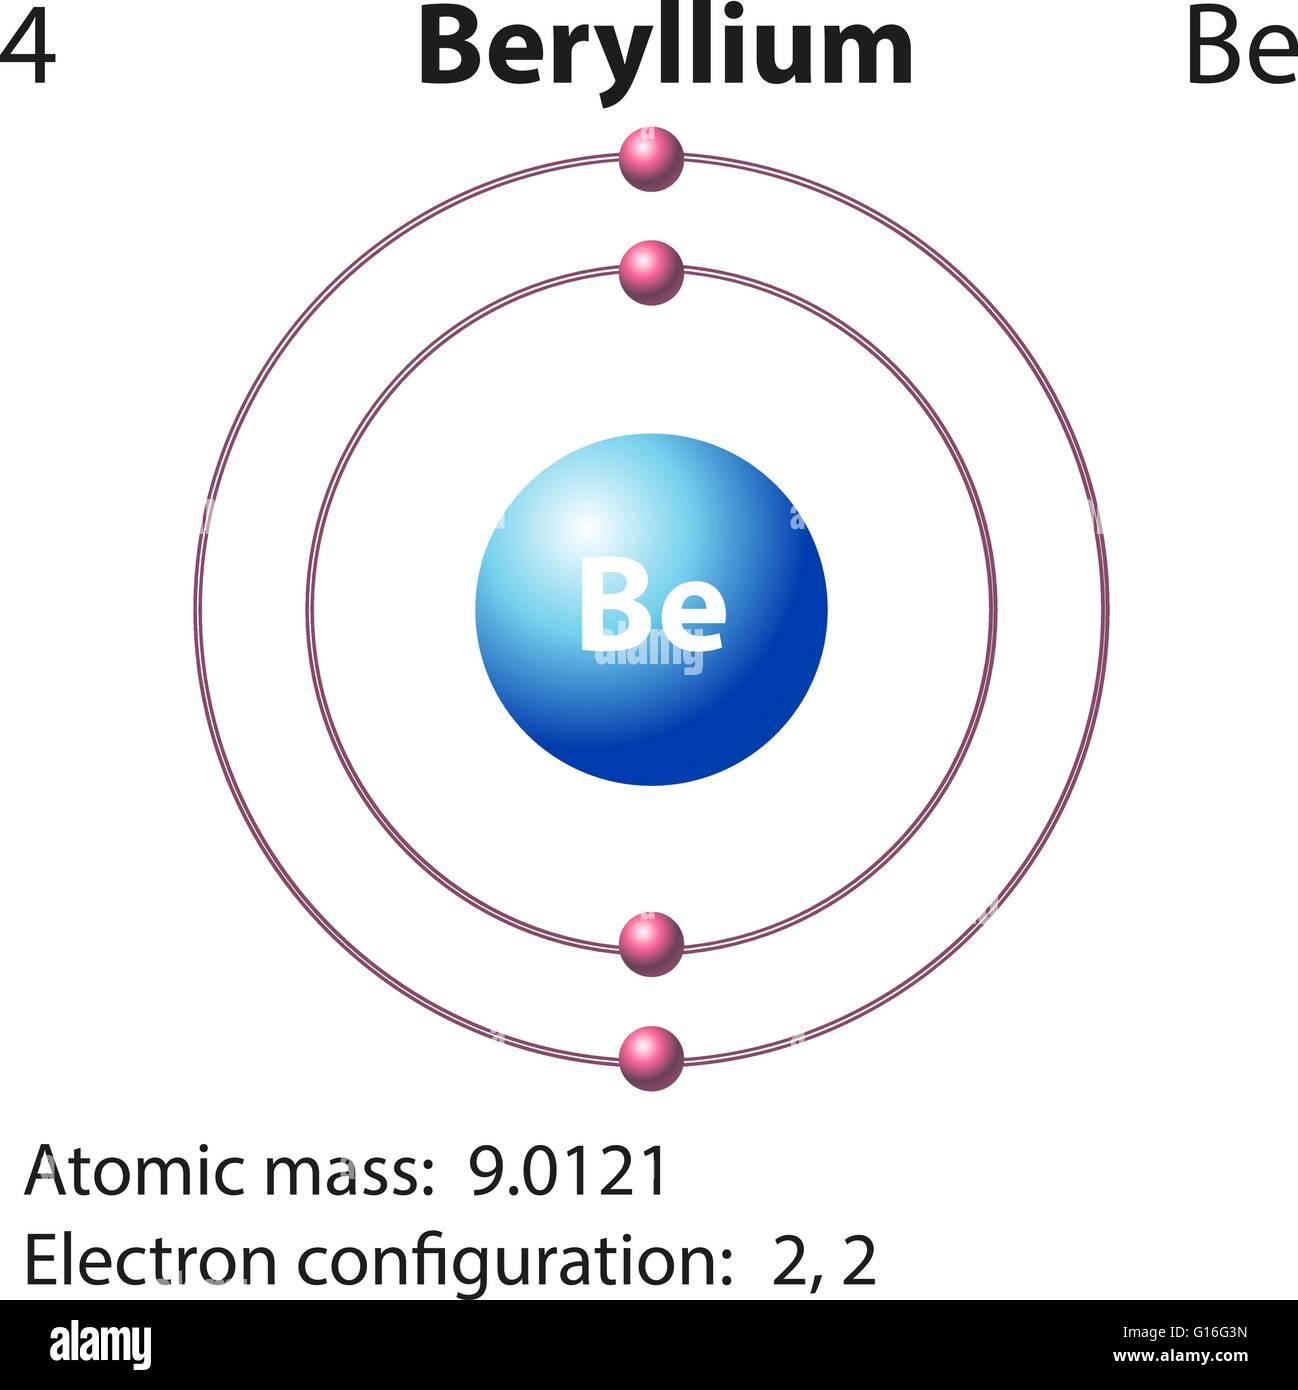 hight resolution of diagram representation of the element beryllium illustration stock image